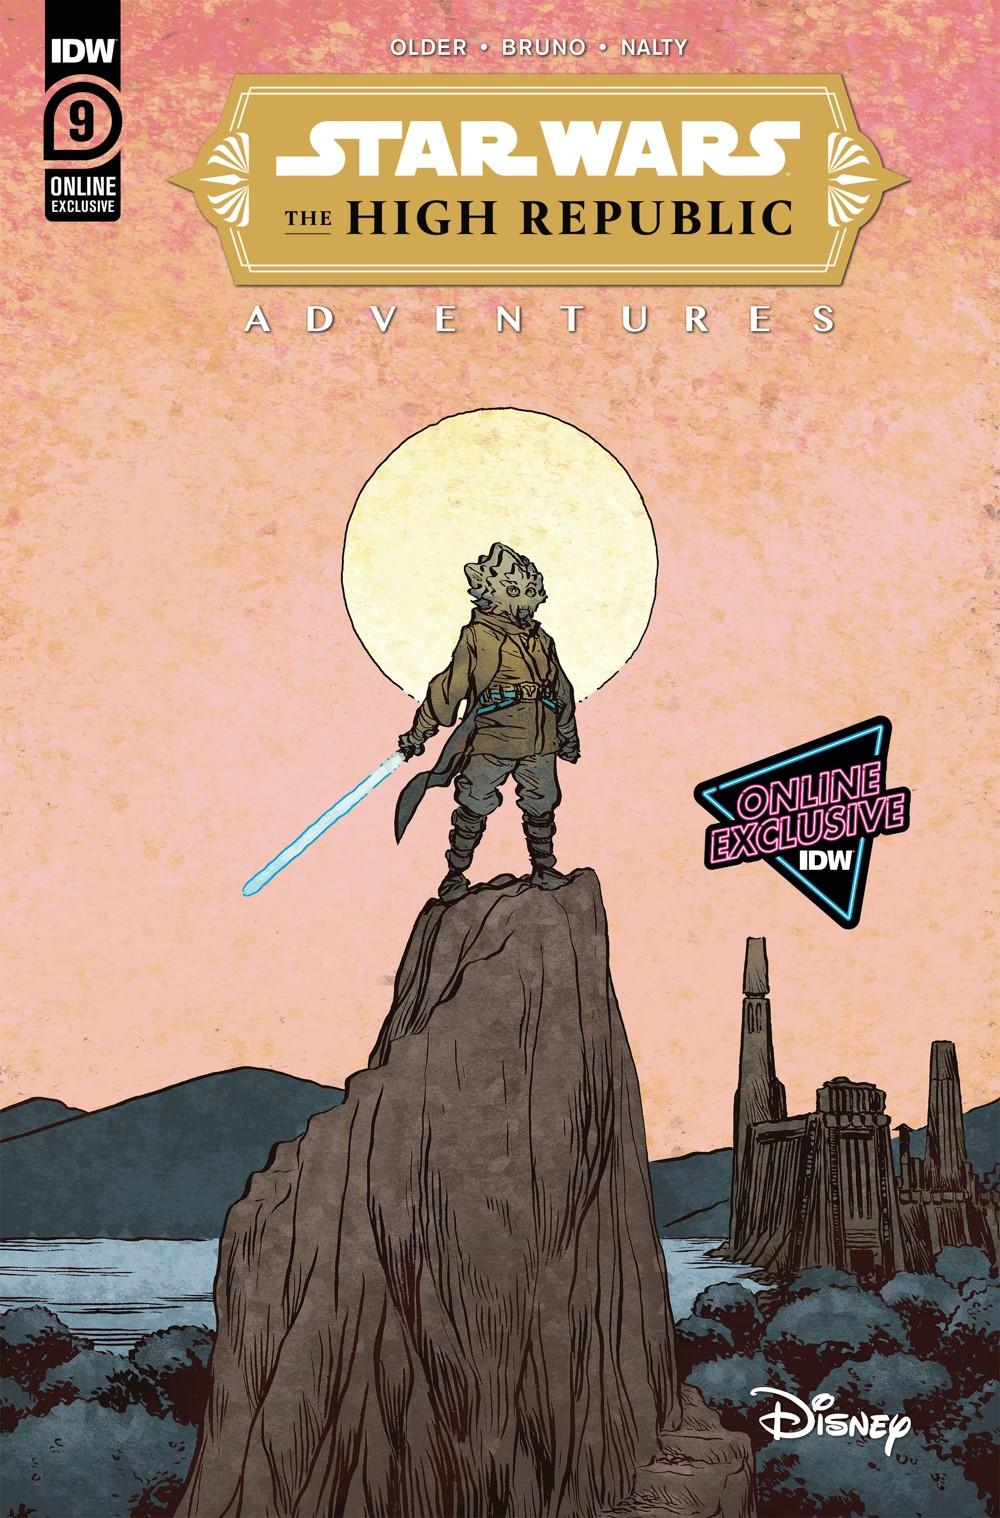 StarWarsHighRepublic-09-DTC ComicList Previews: STAR WARS THE HIGH REPUBLIC ADVENTURES #9